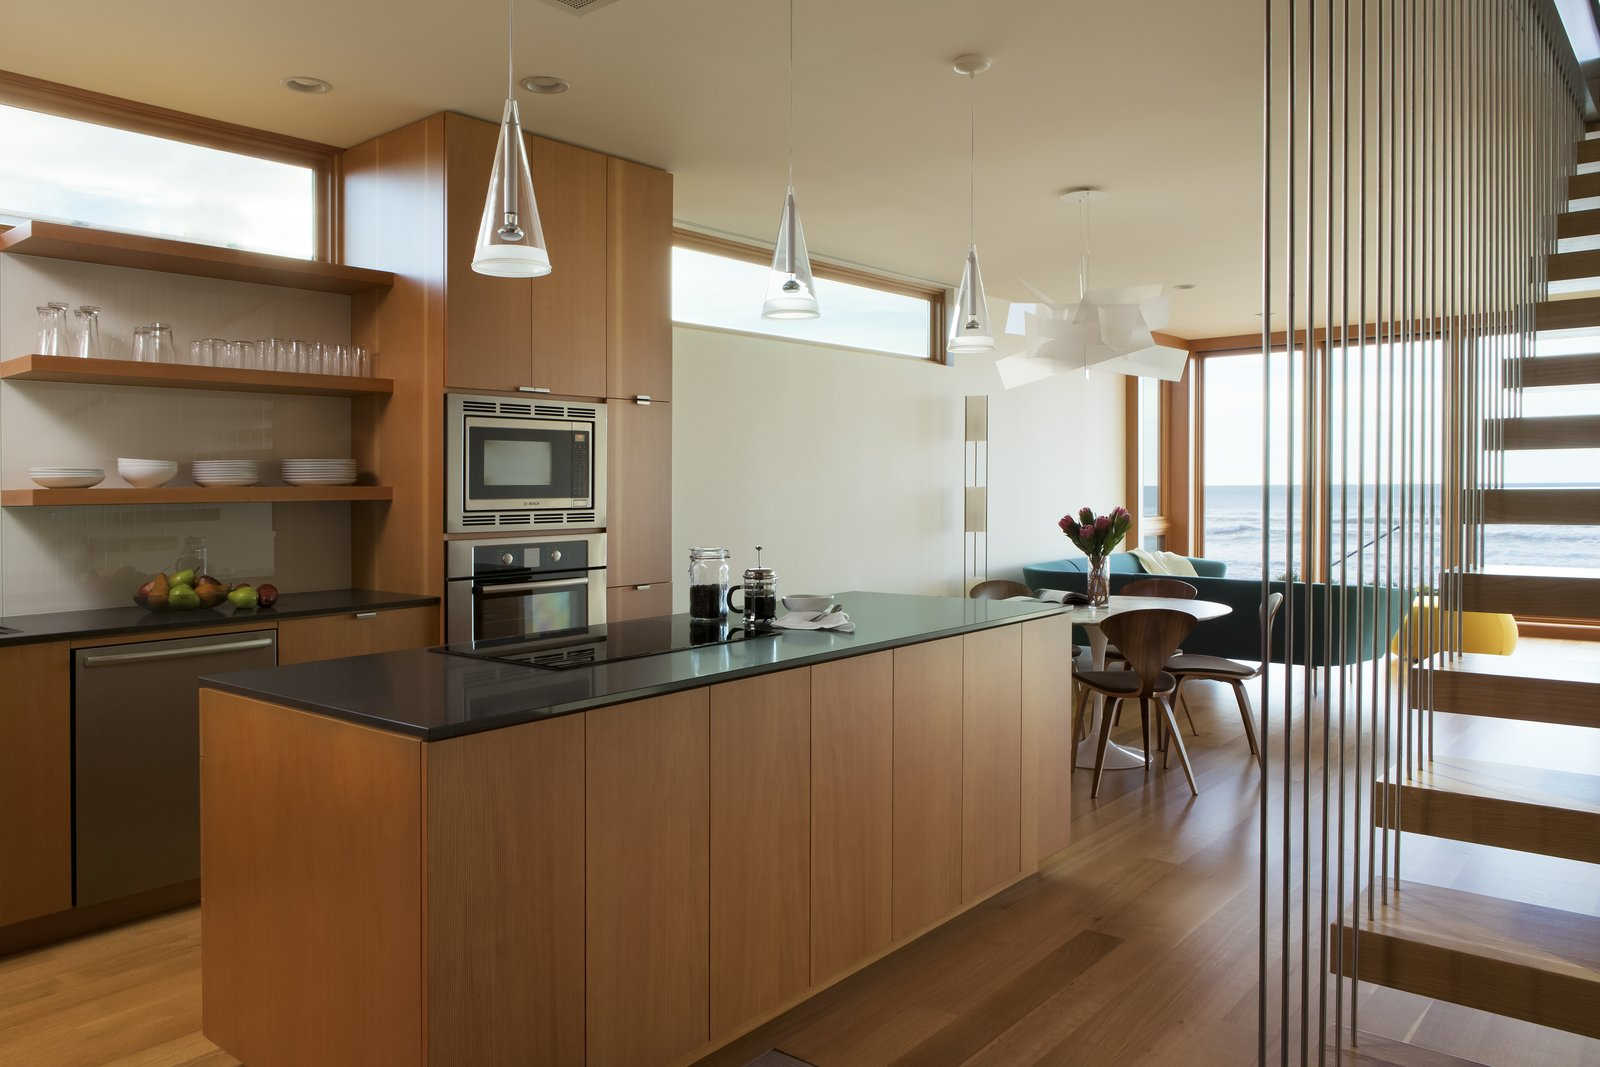 Kitchen  Roads End Beach House by Giulietti / Schouten AIA Architects